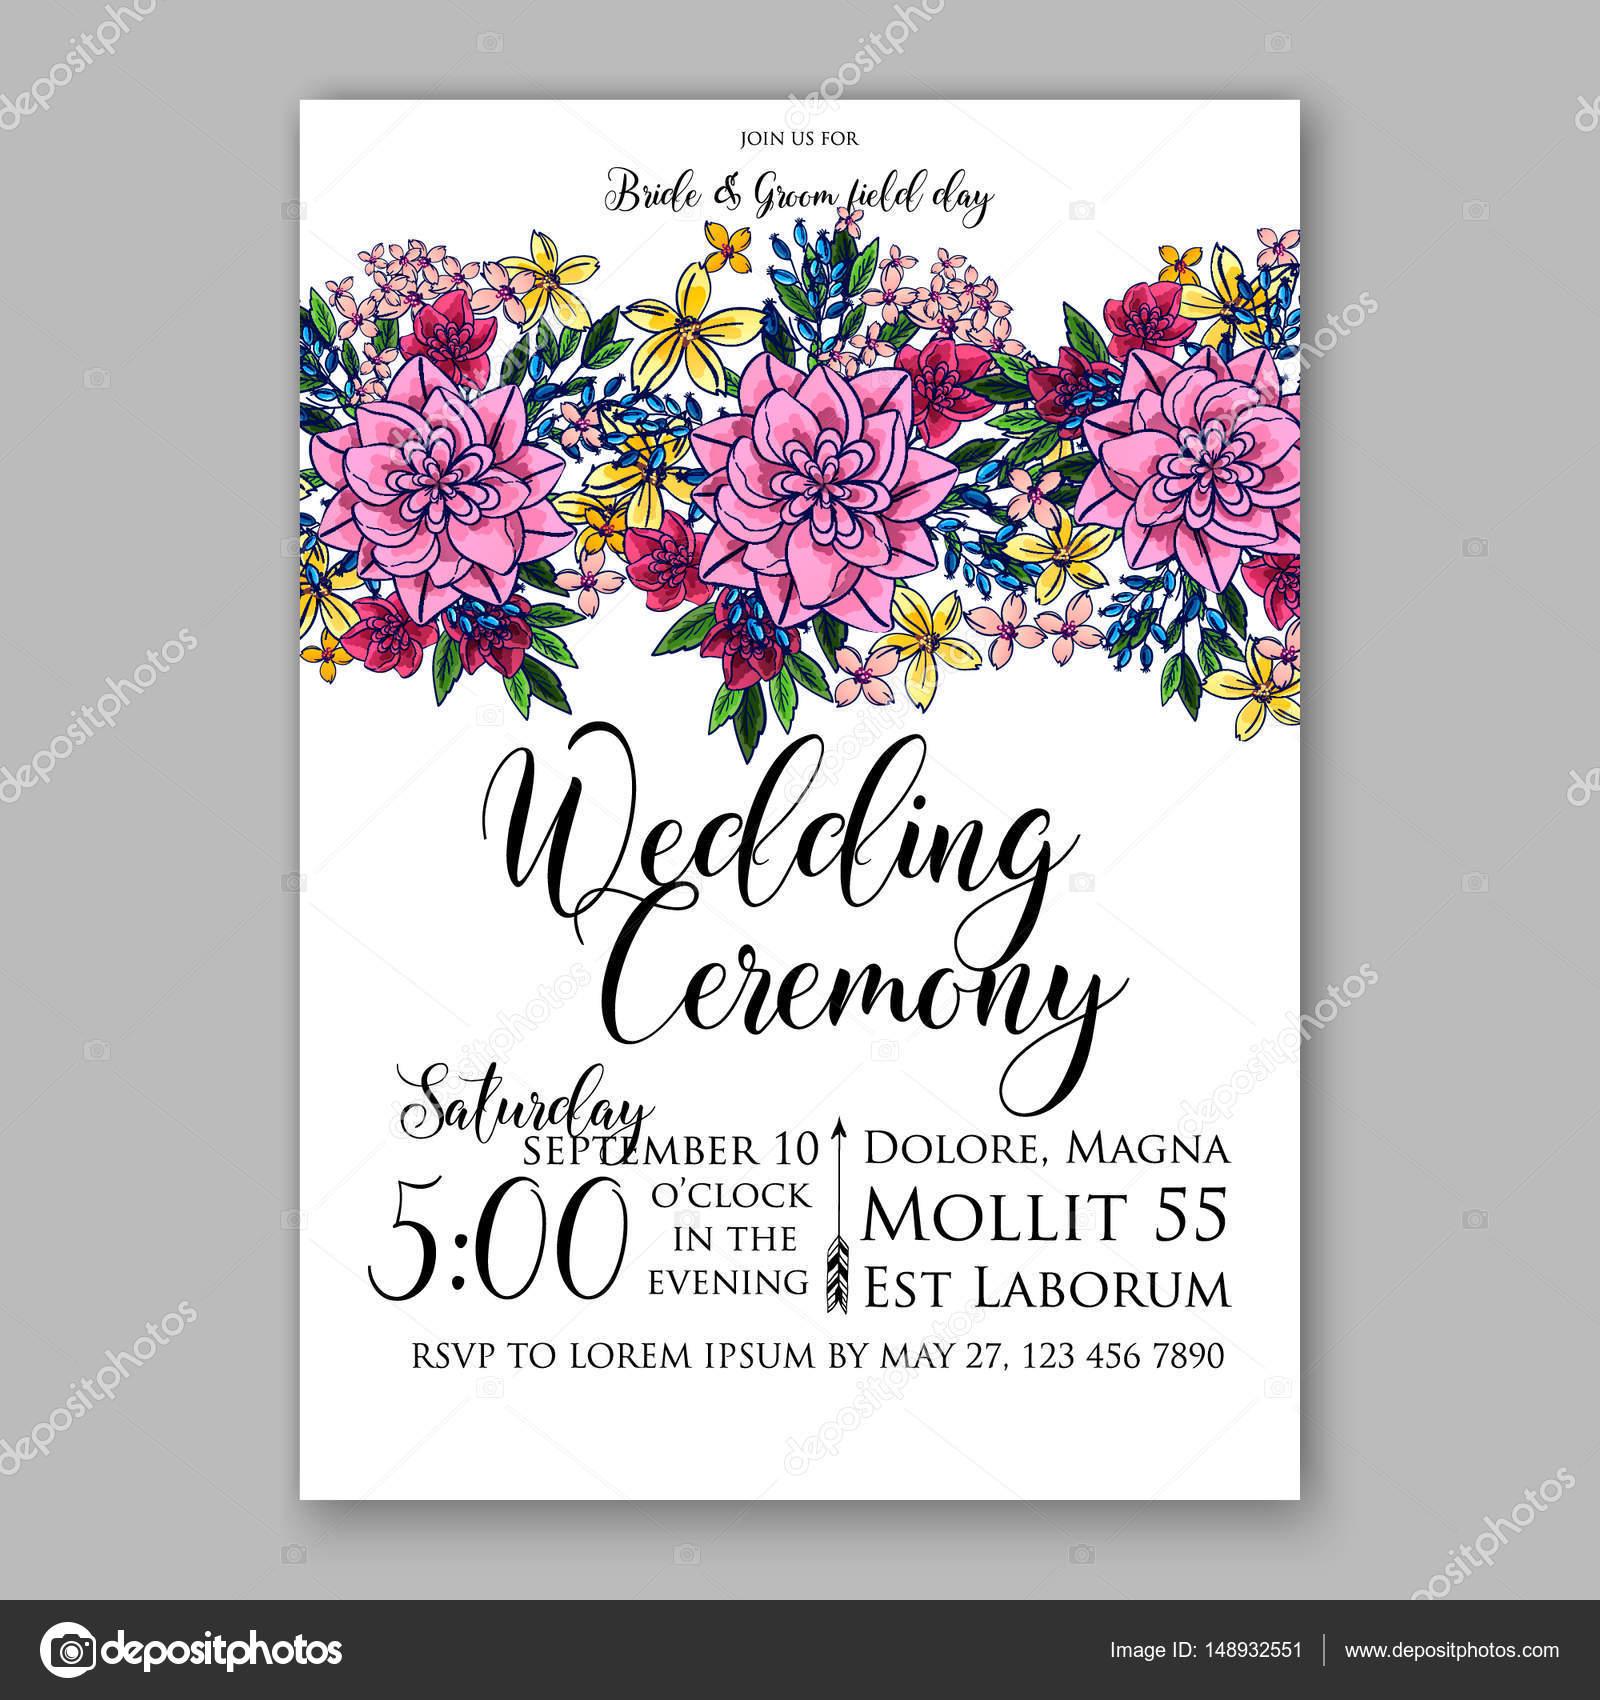 Pink chrysantemum peony wedding invitation card printable template wedding invitation card printable template with pink chrysantemum daisy peony vector by samka ua stopboris Image collections